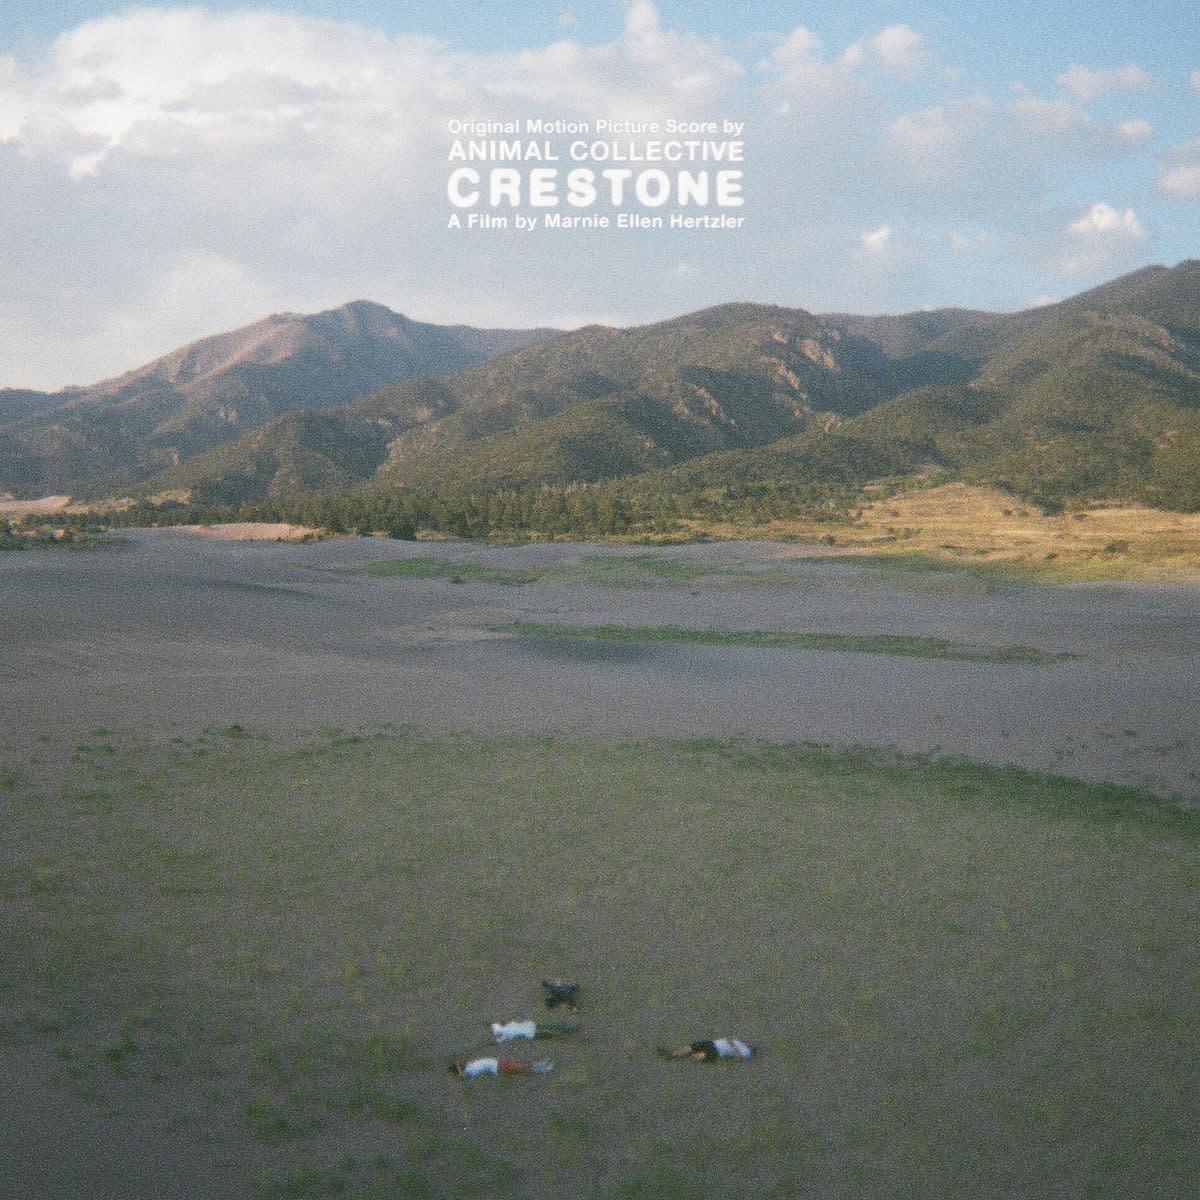 Rock/Pop Animal Collective - Crestone (Original Motion Picture Score)